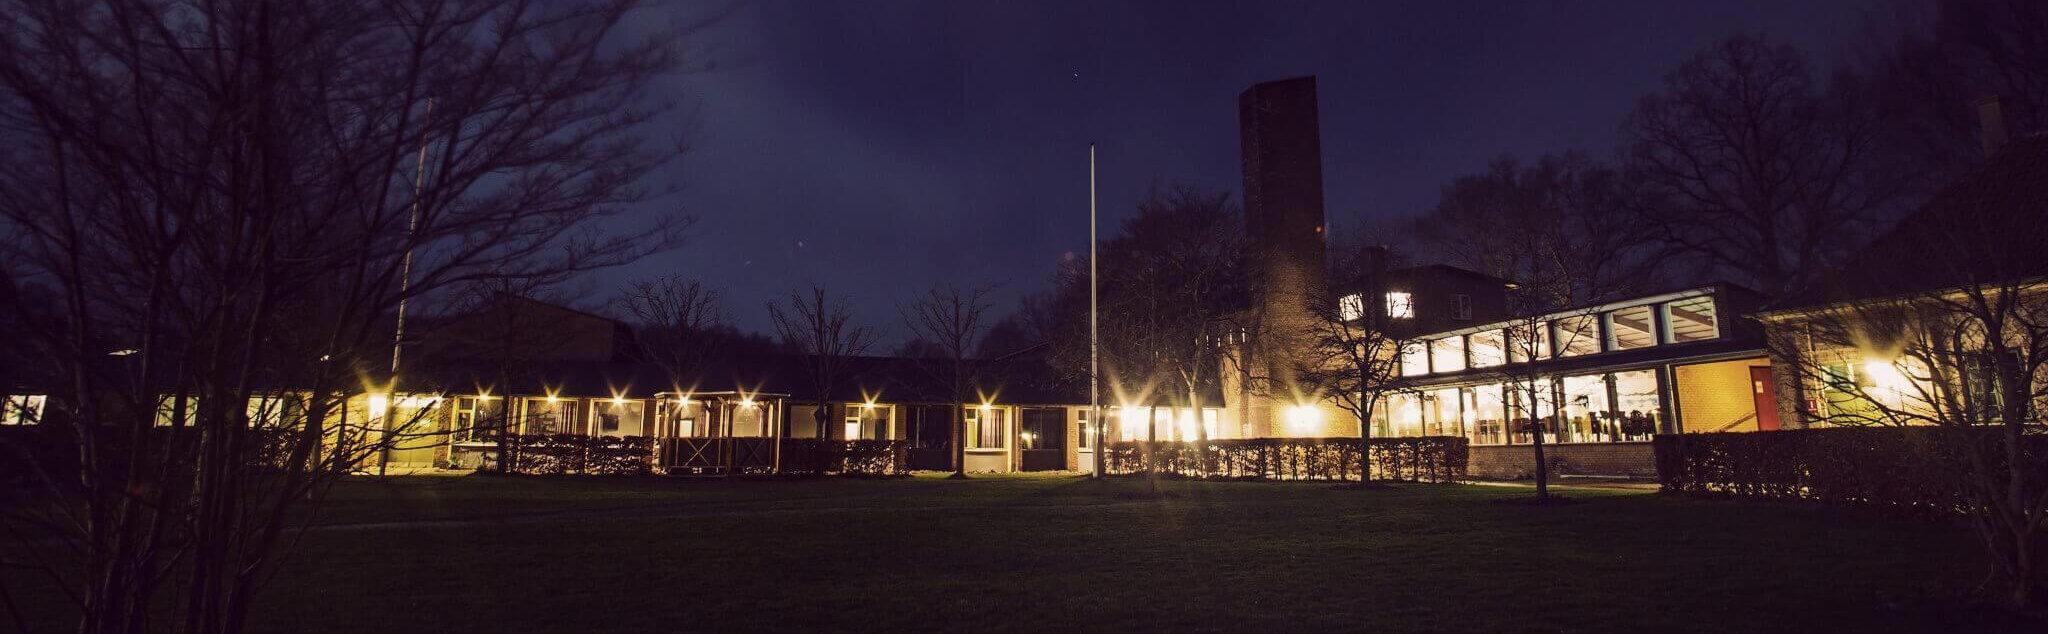 IPC - International People's College facilities at night - a folk high school in Denmark